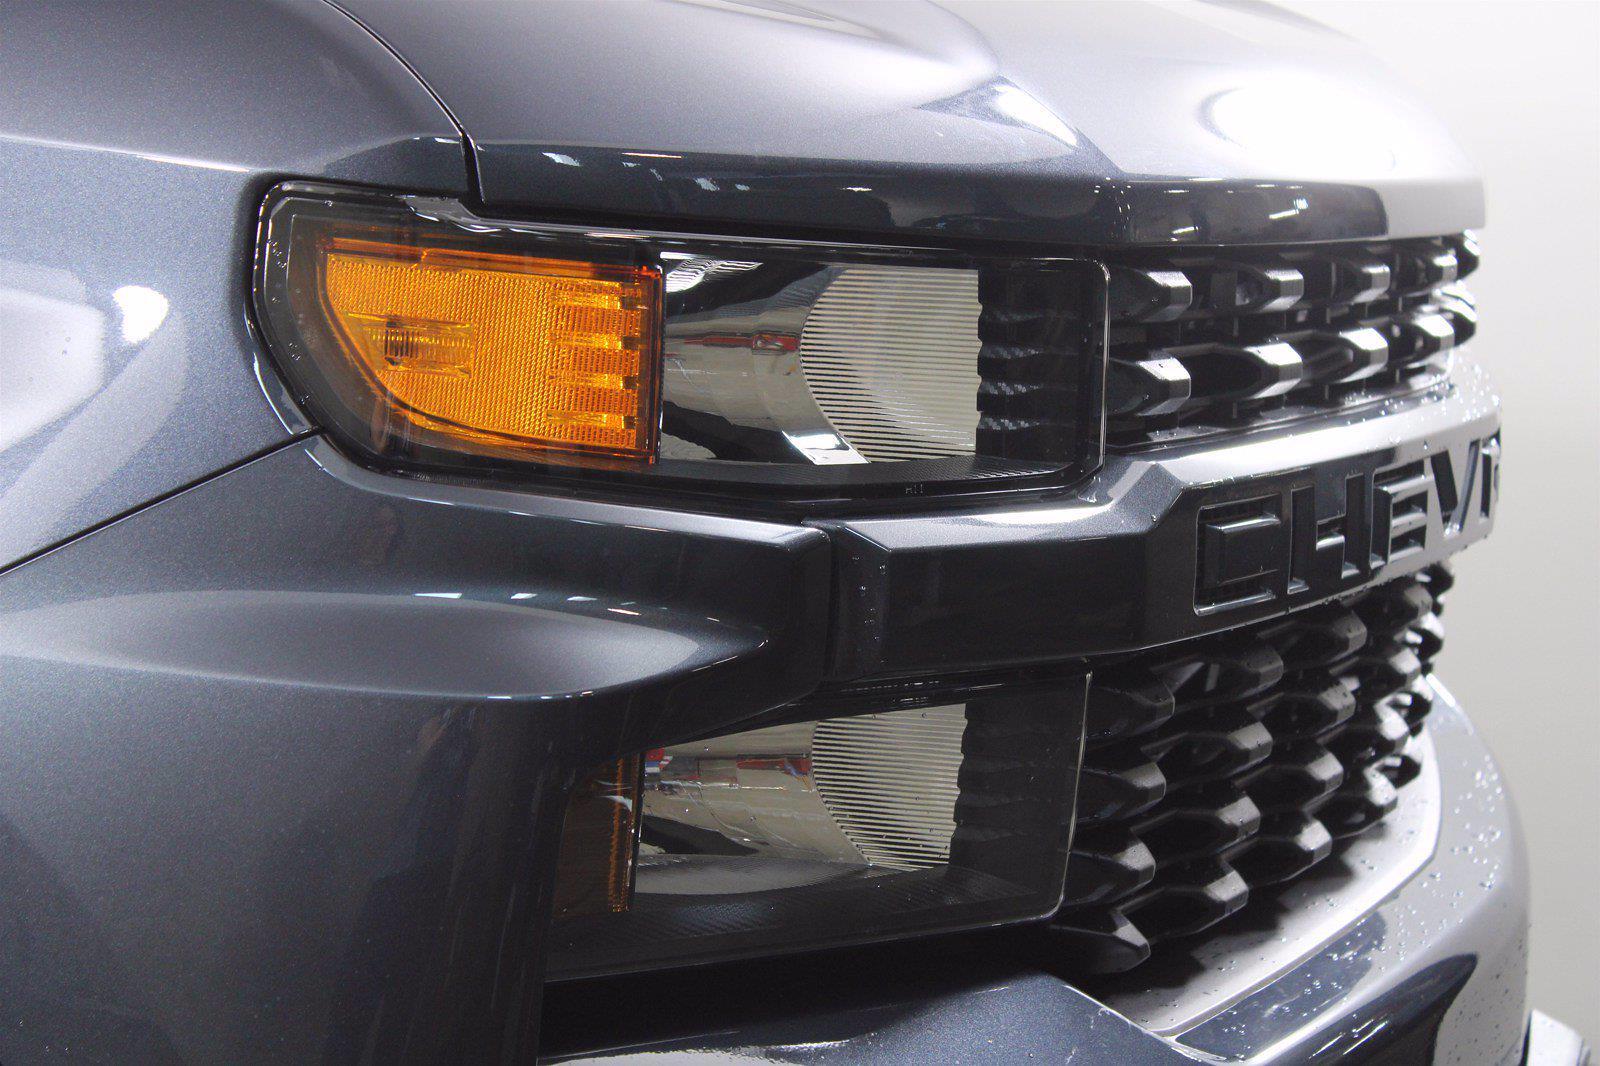 2021 Chevrolet Silverado 1500 Double Cab 4x4, Pickup #D111013 - photo 5